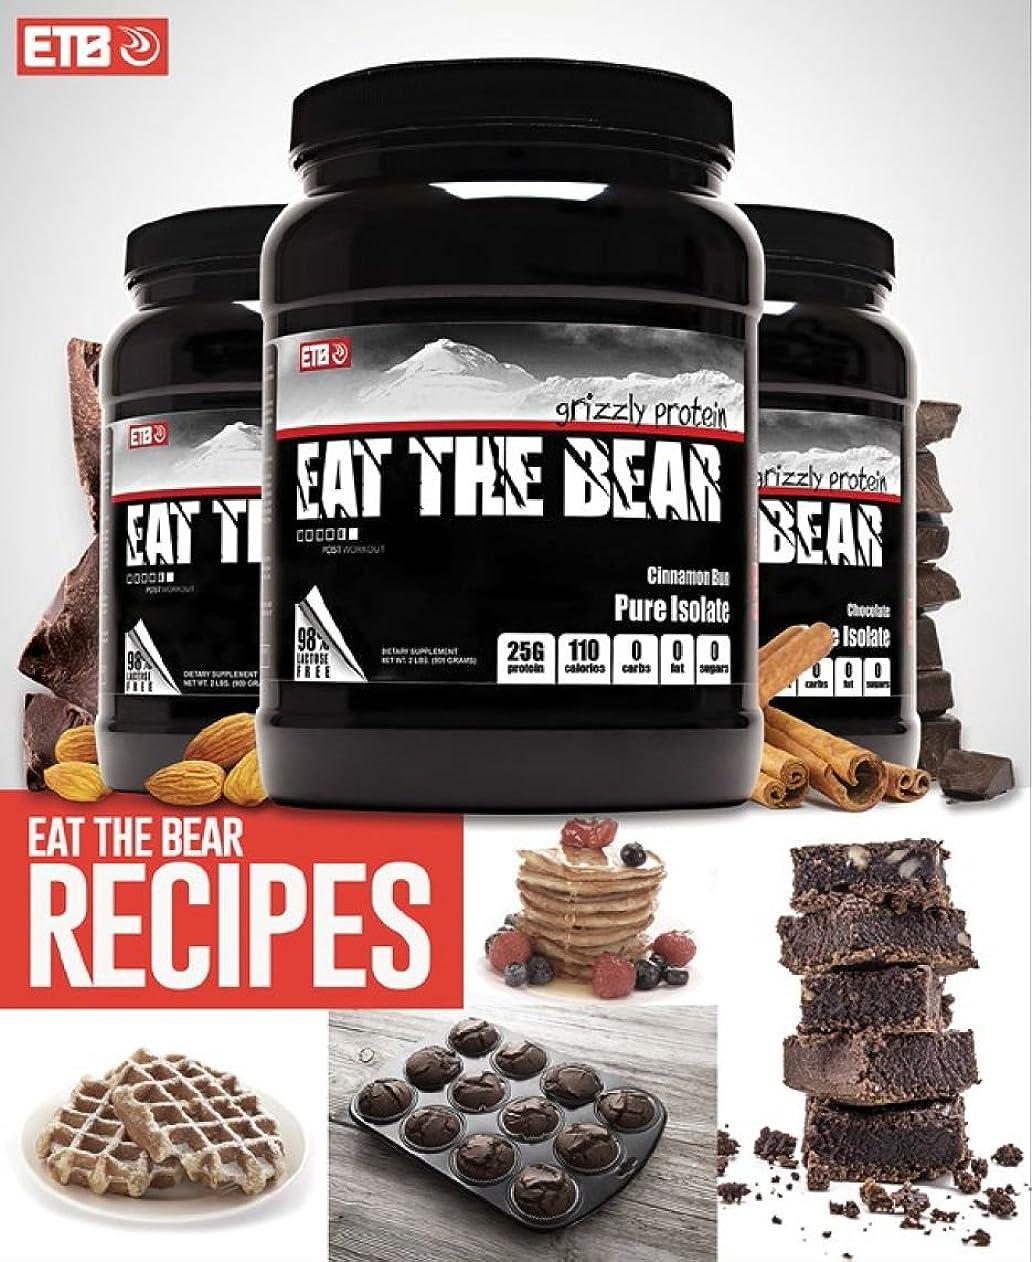 Eat The Bear Whey Protein Powder Baking Recipes (English Edition)